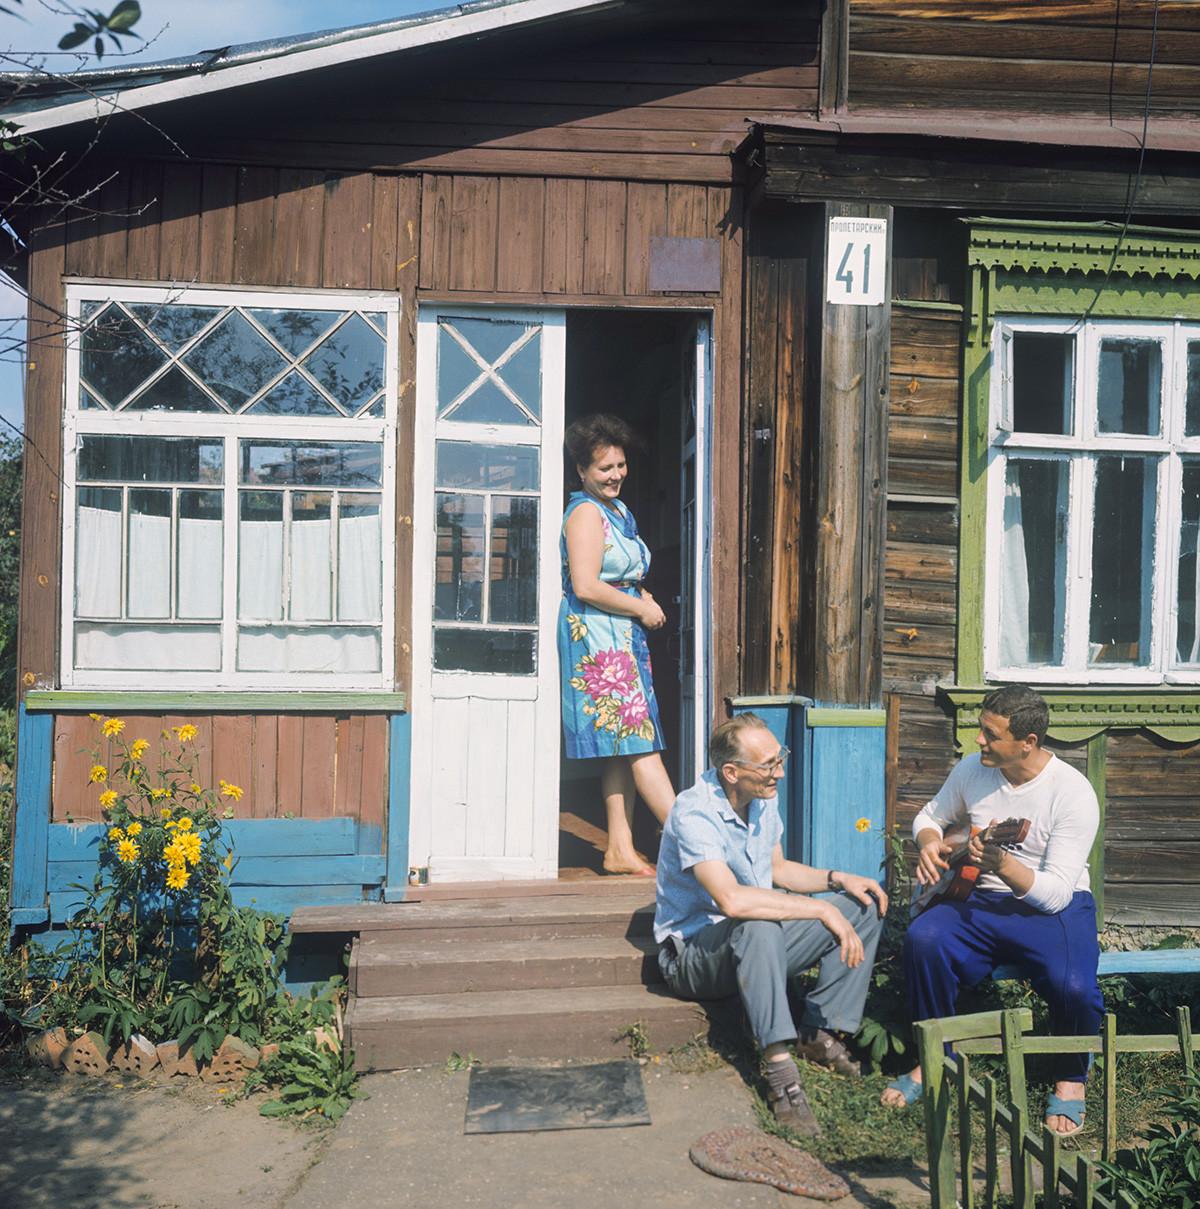 Soviet cosmonaut Vladislav Volkov at the dacha, with his family